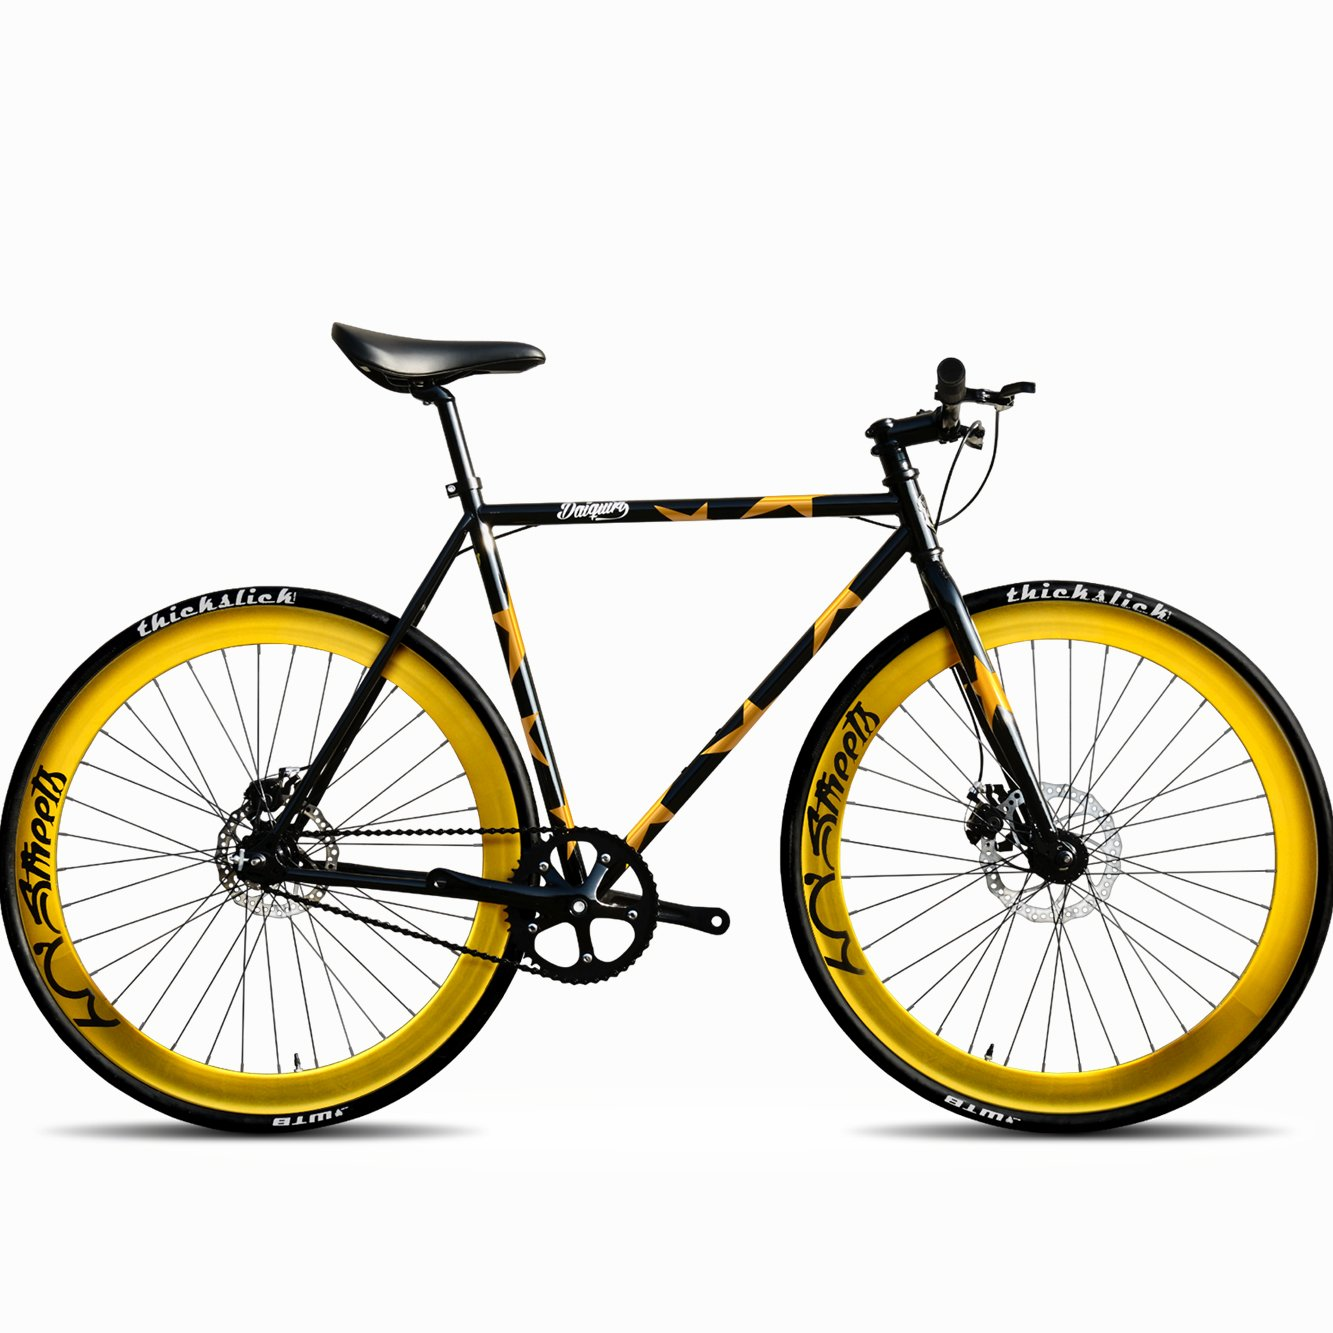 Olx Bike Lanka